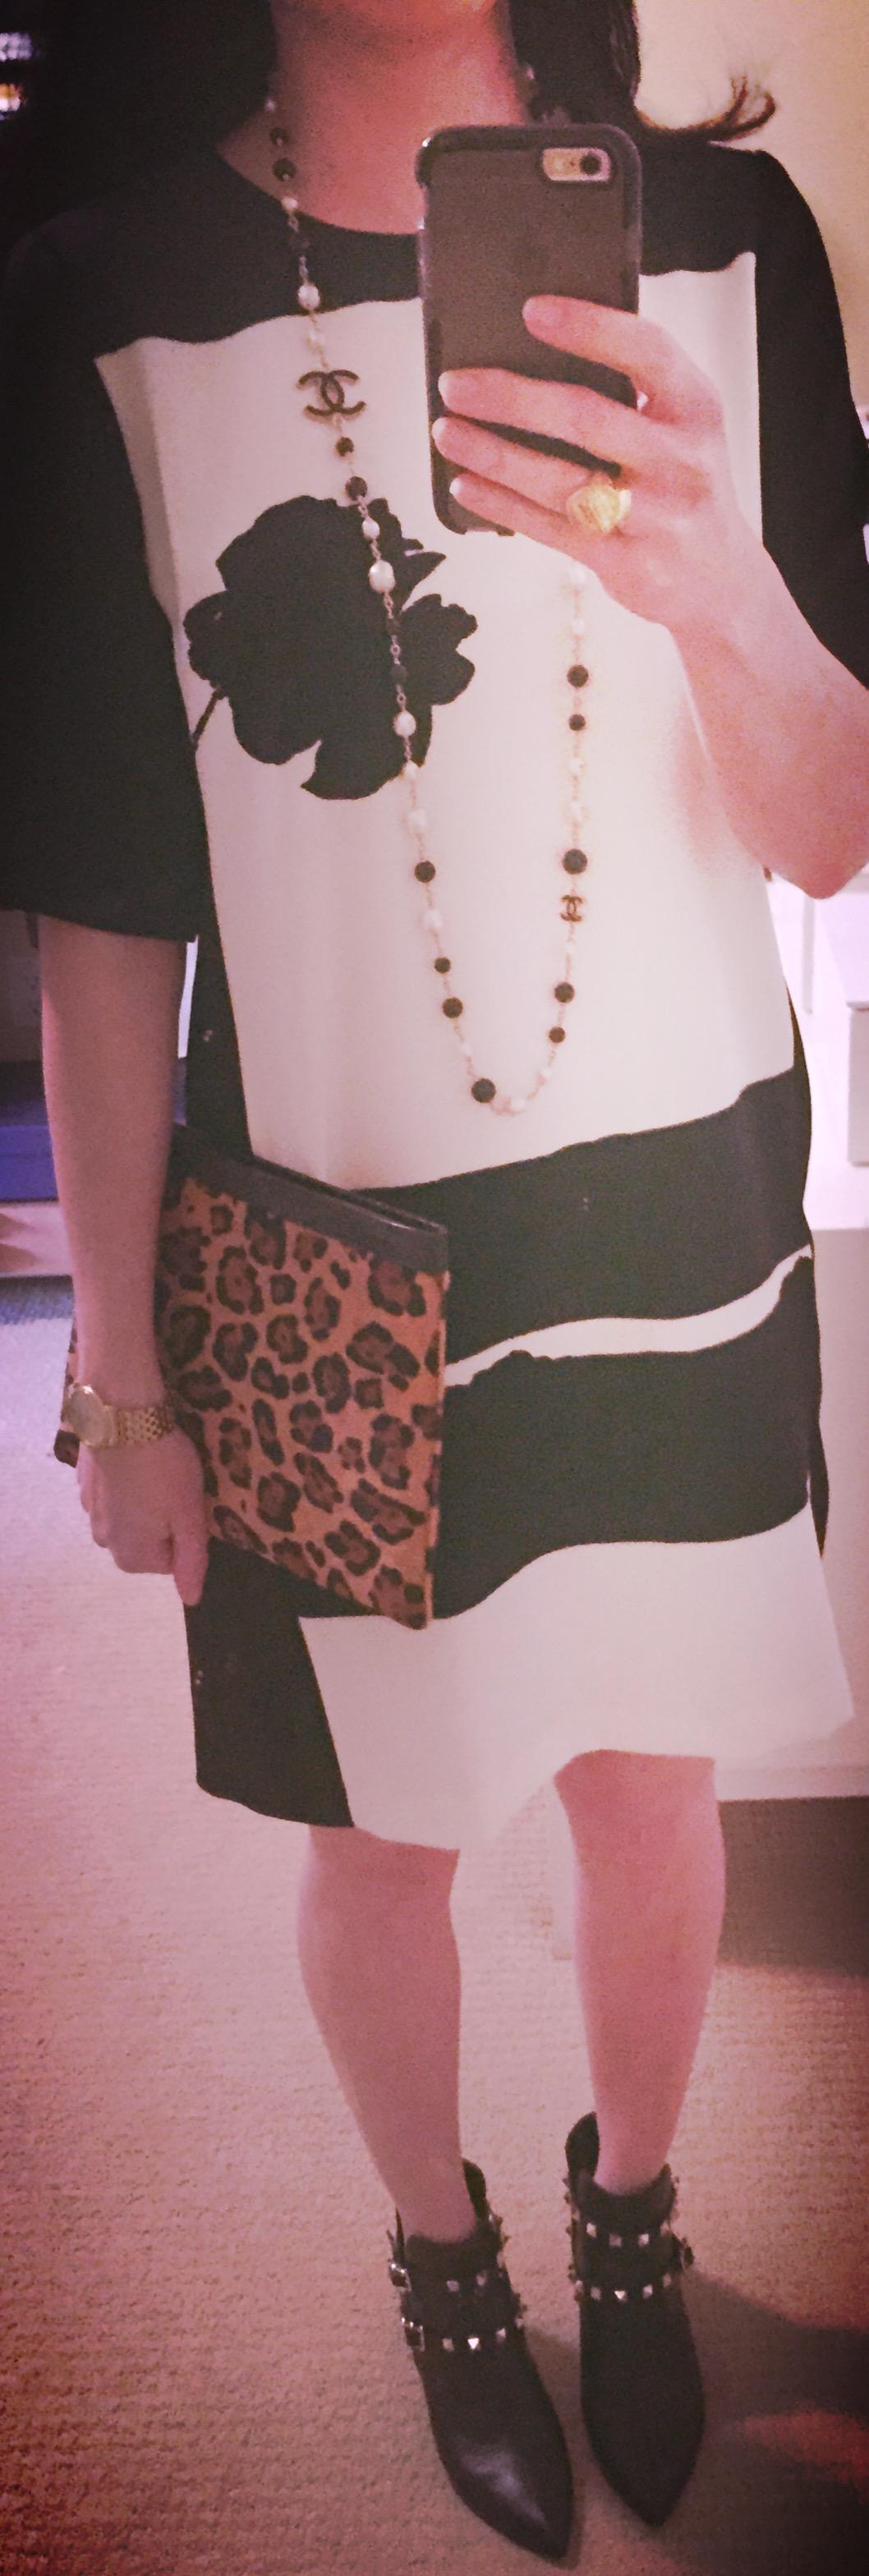 Jan 6, Zara Shift Dress with Valentino Booties